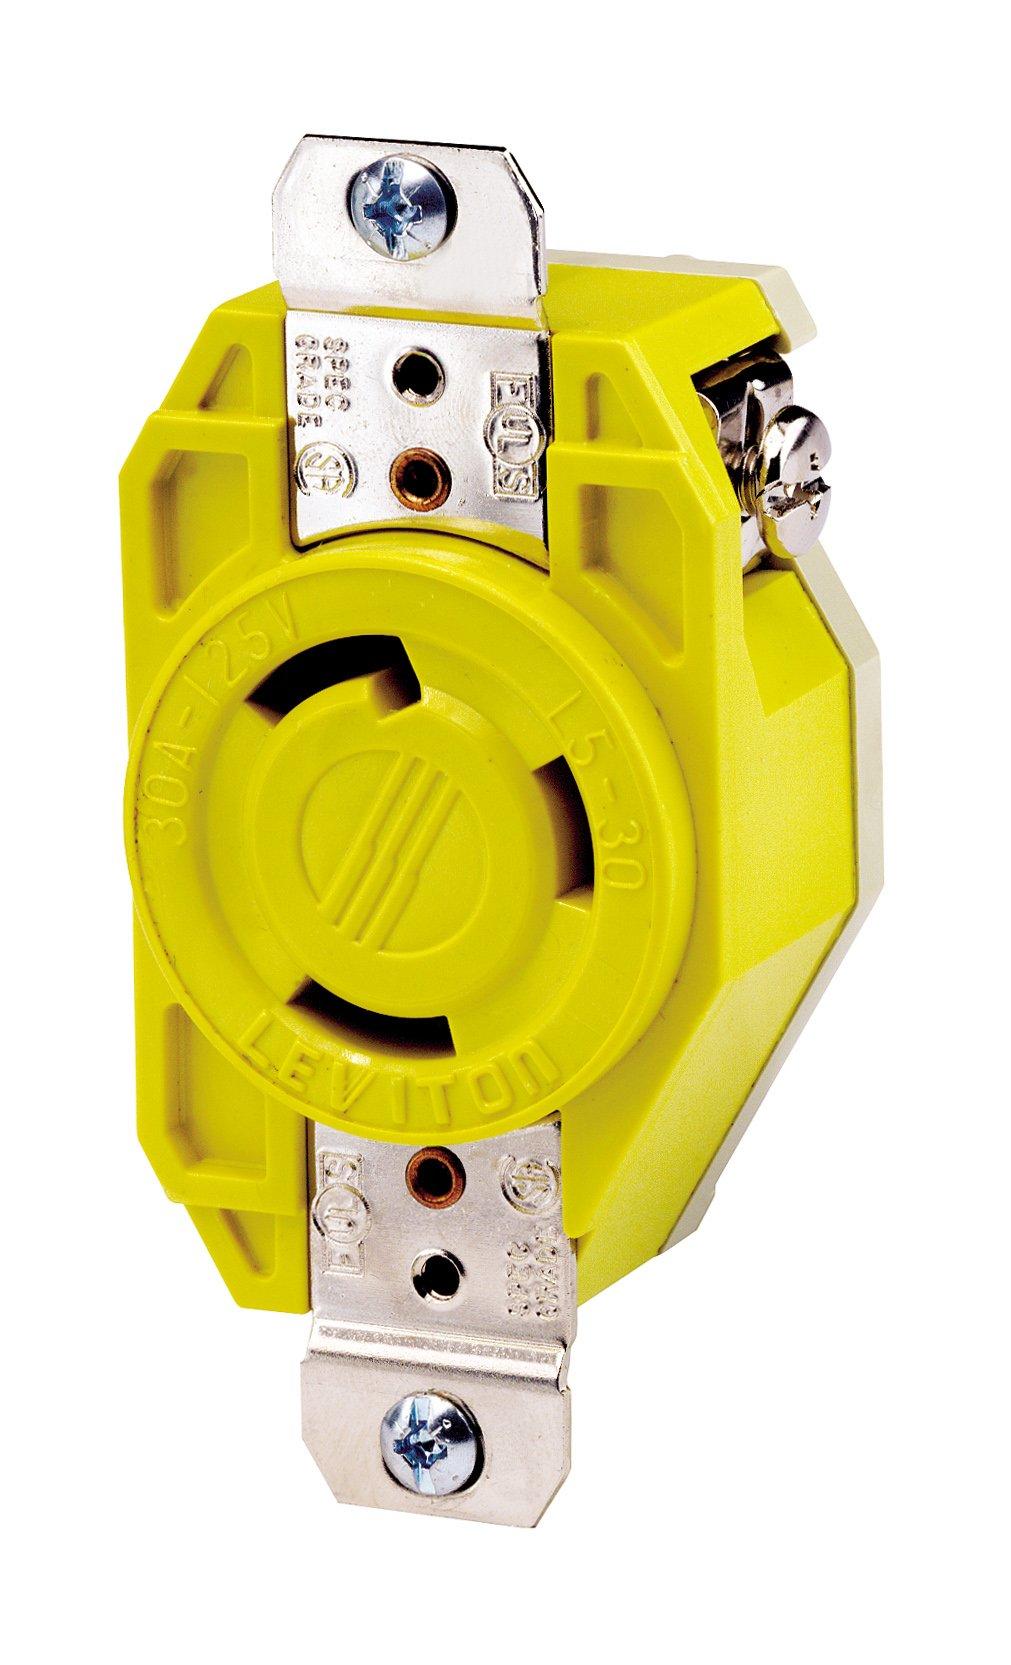 Leviton 26CM-10 30 Amp, 125 Volt, Flush Mounting Locking Receptacle, Industrial Grade, Grounding, Corrosion Resistant, Yellow